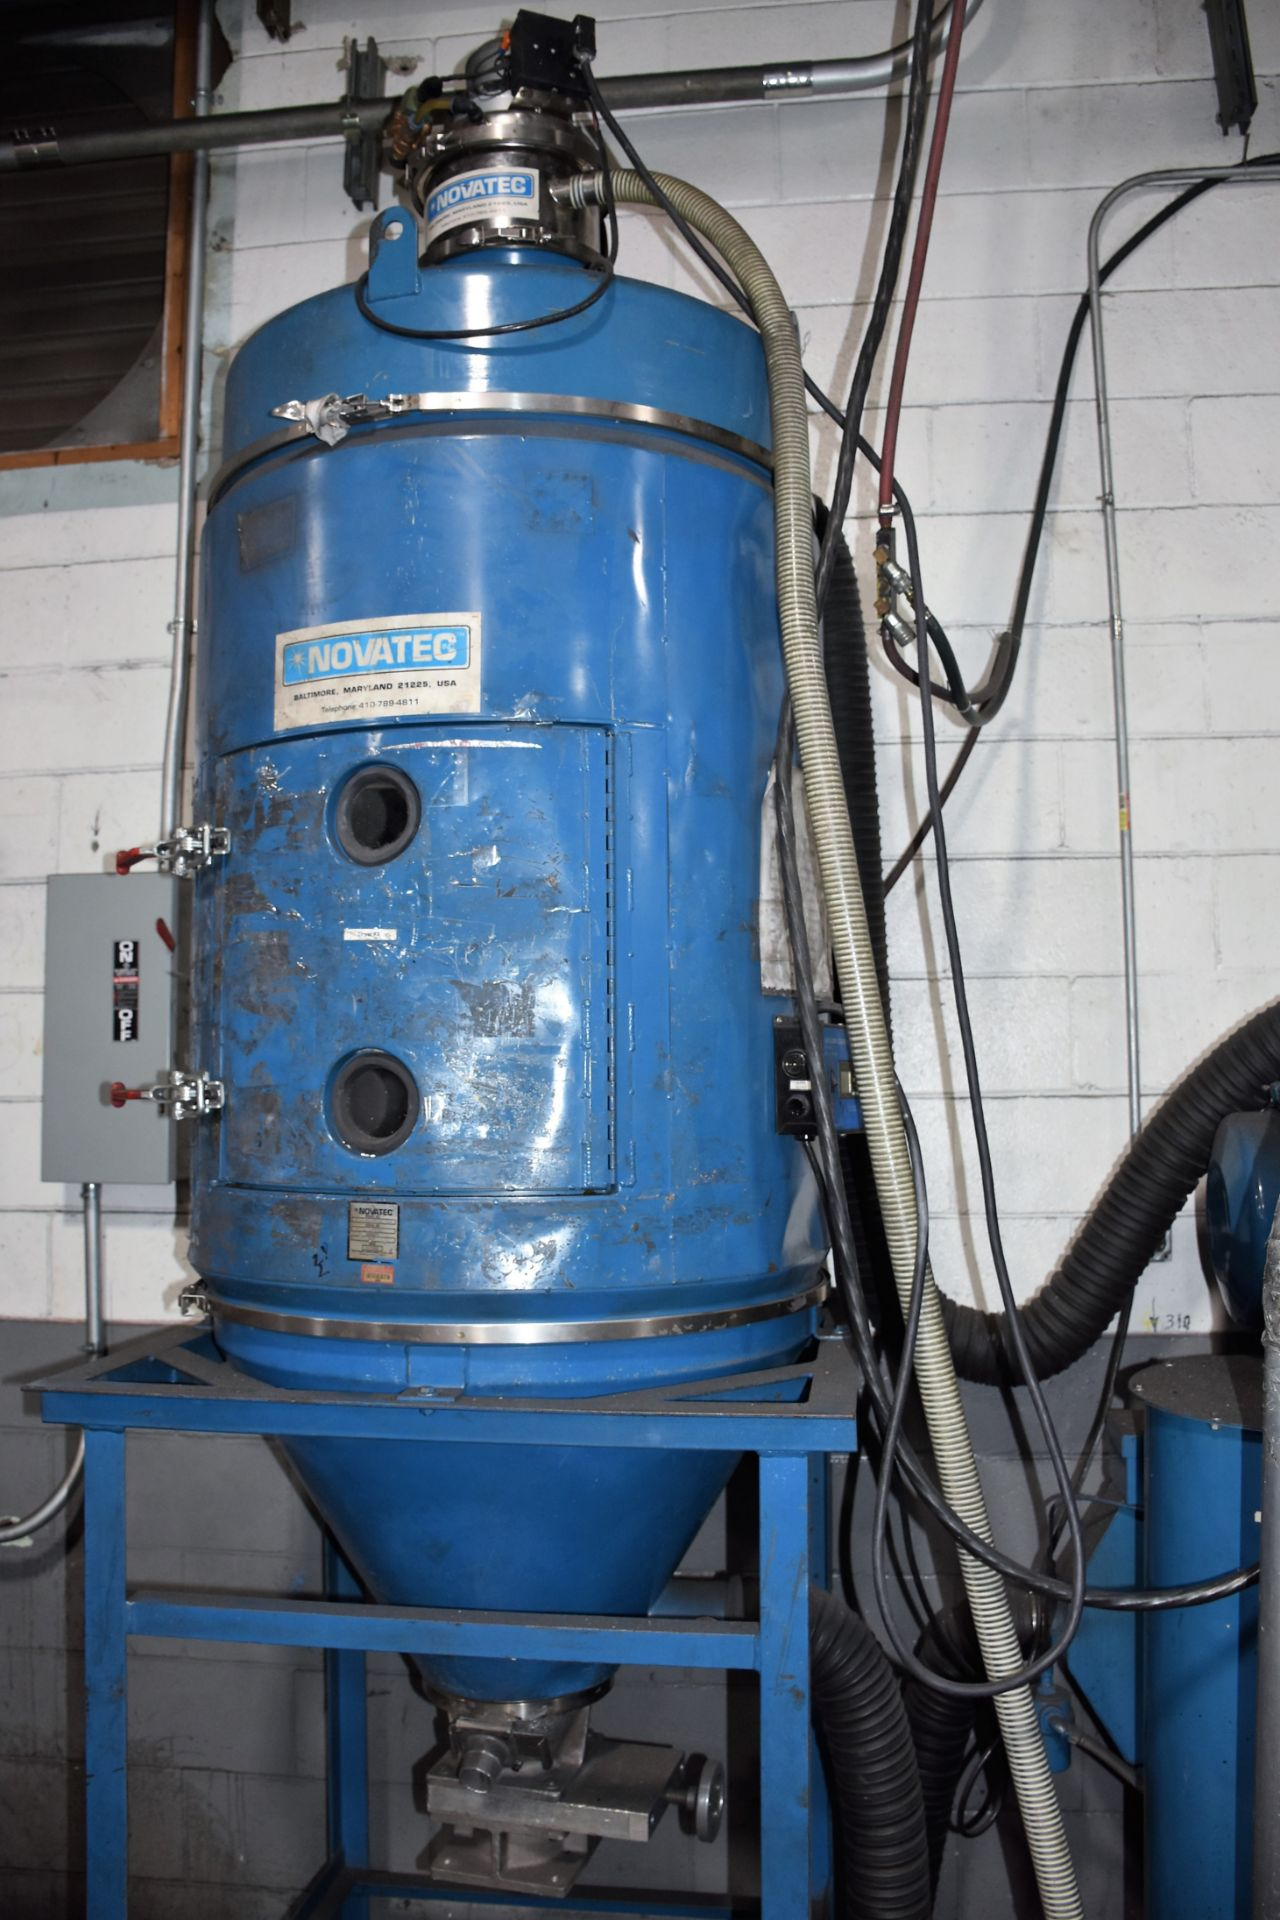 Novatec Vacum & Dryer, NPC-220 - Image 2 of 4